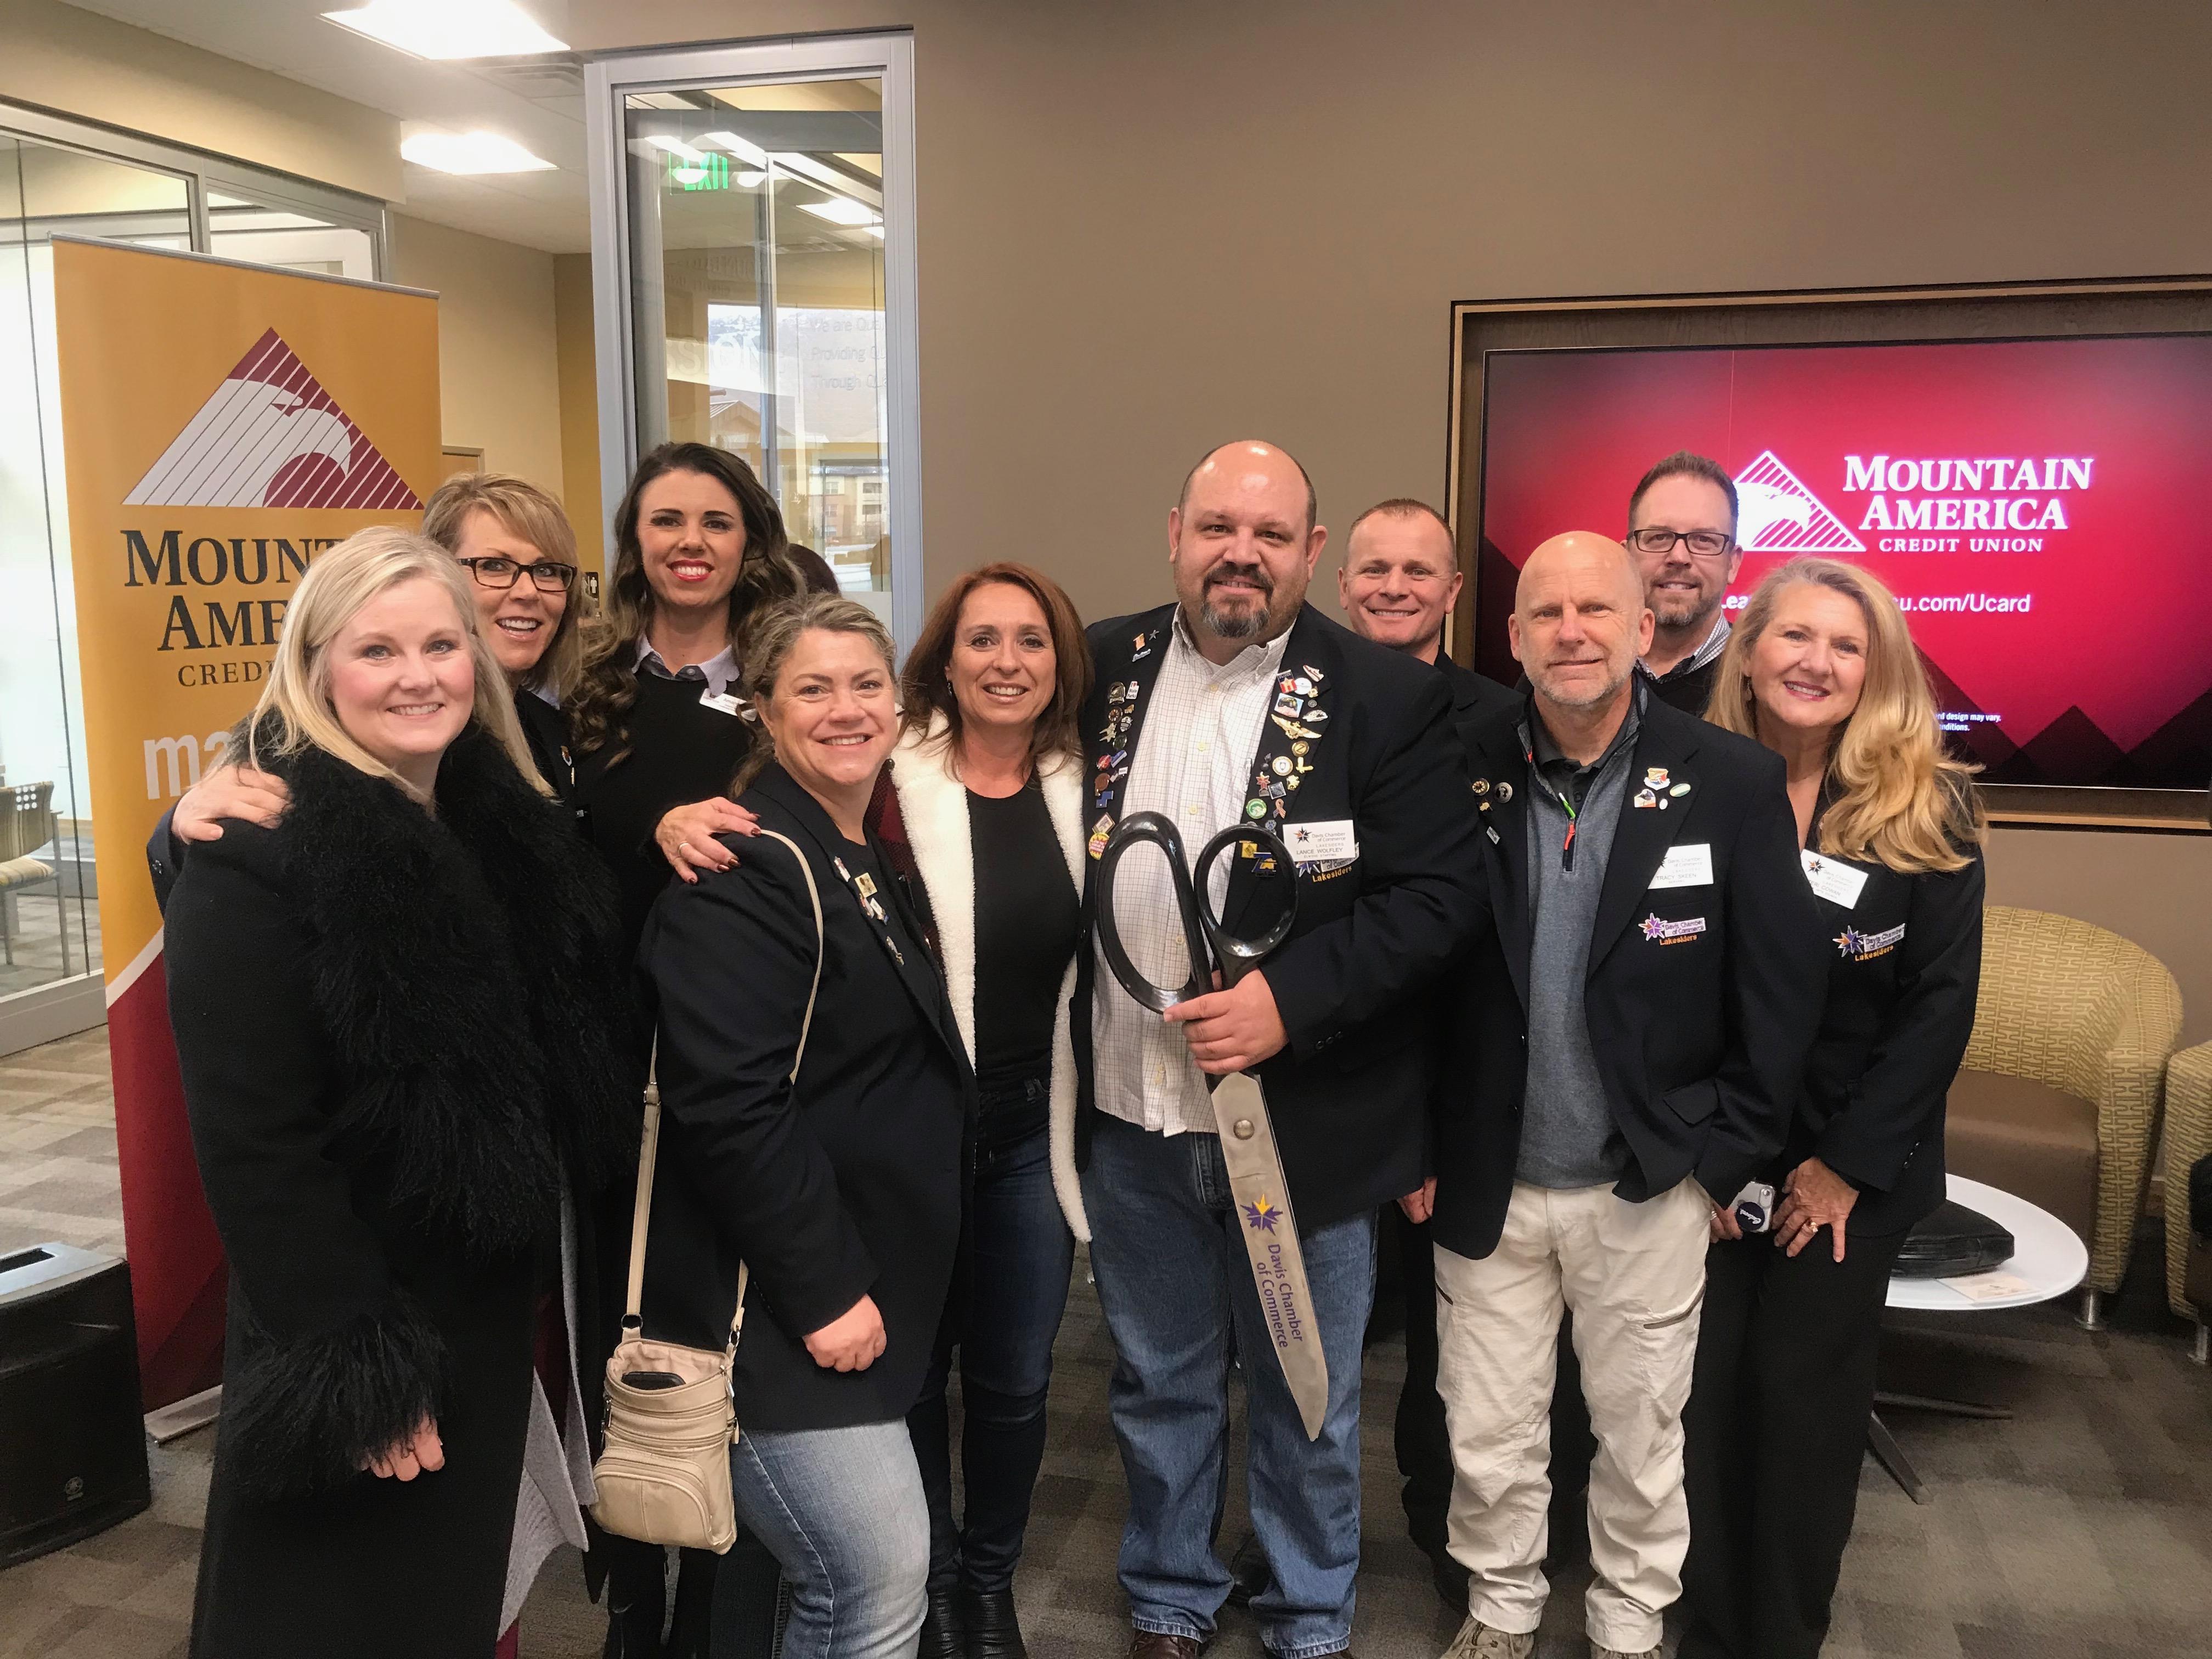 Mountain America Credit Union Ribbon Cutting - Davis County